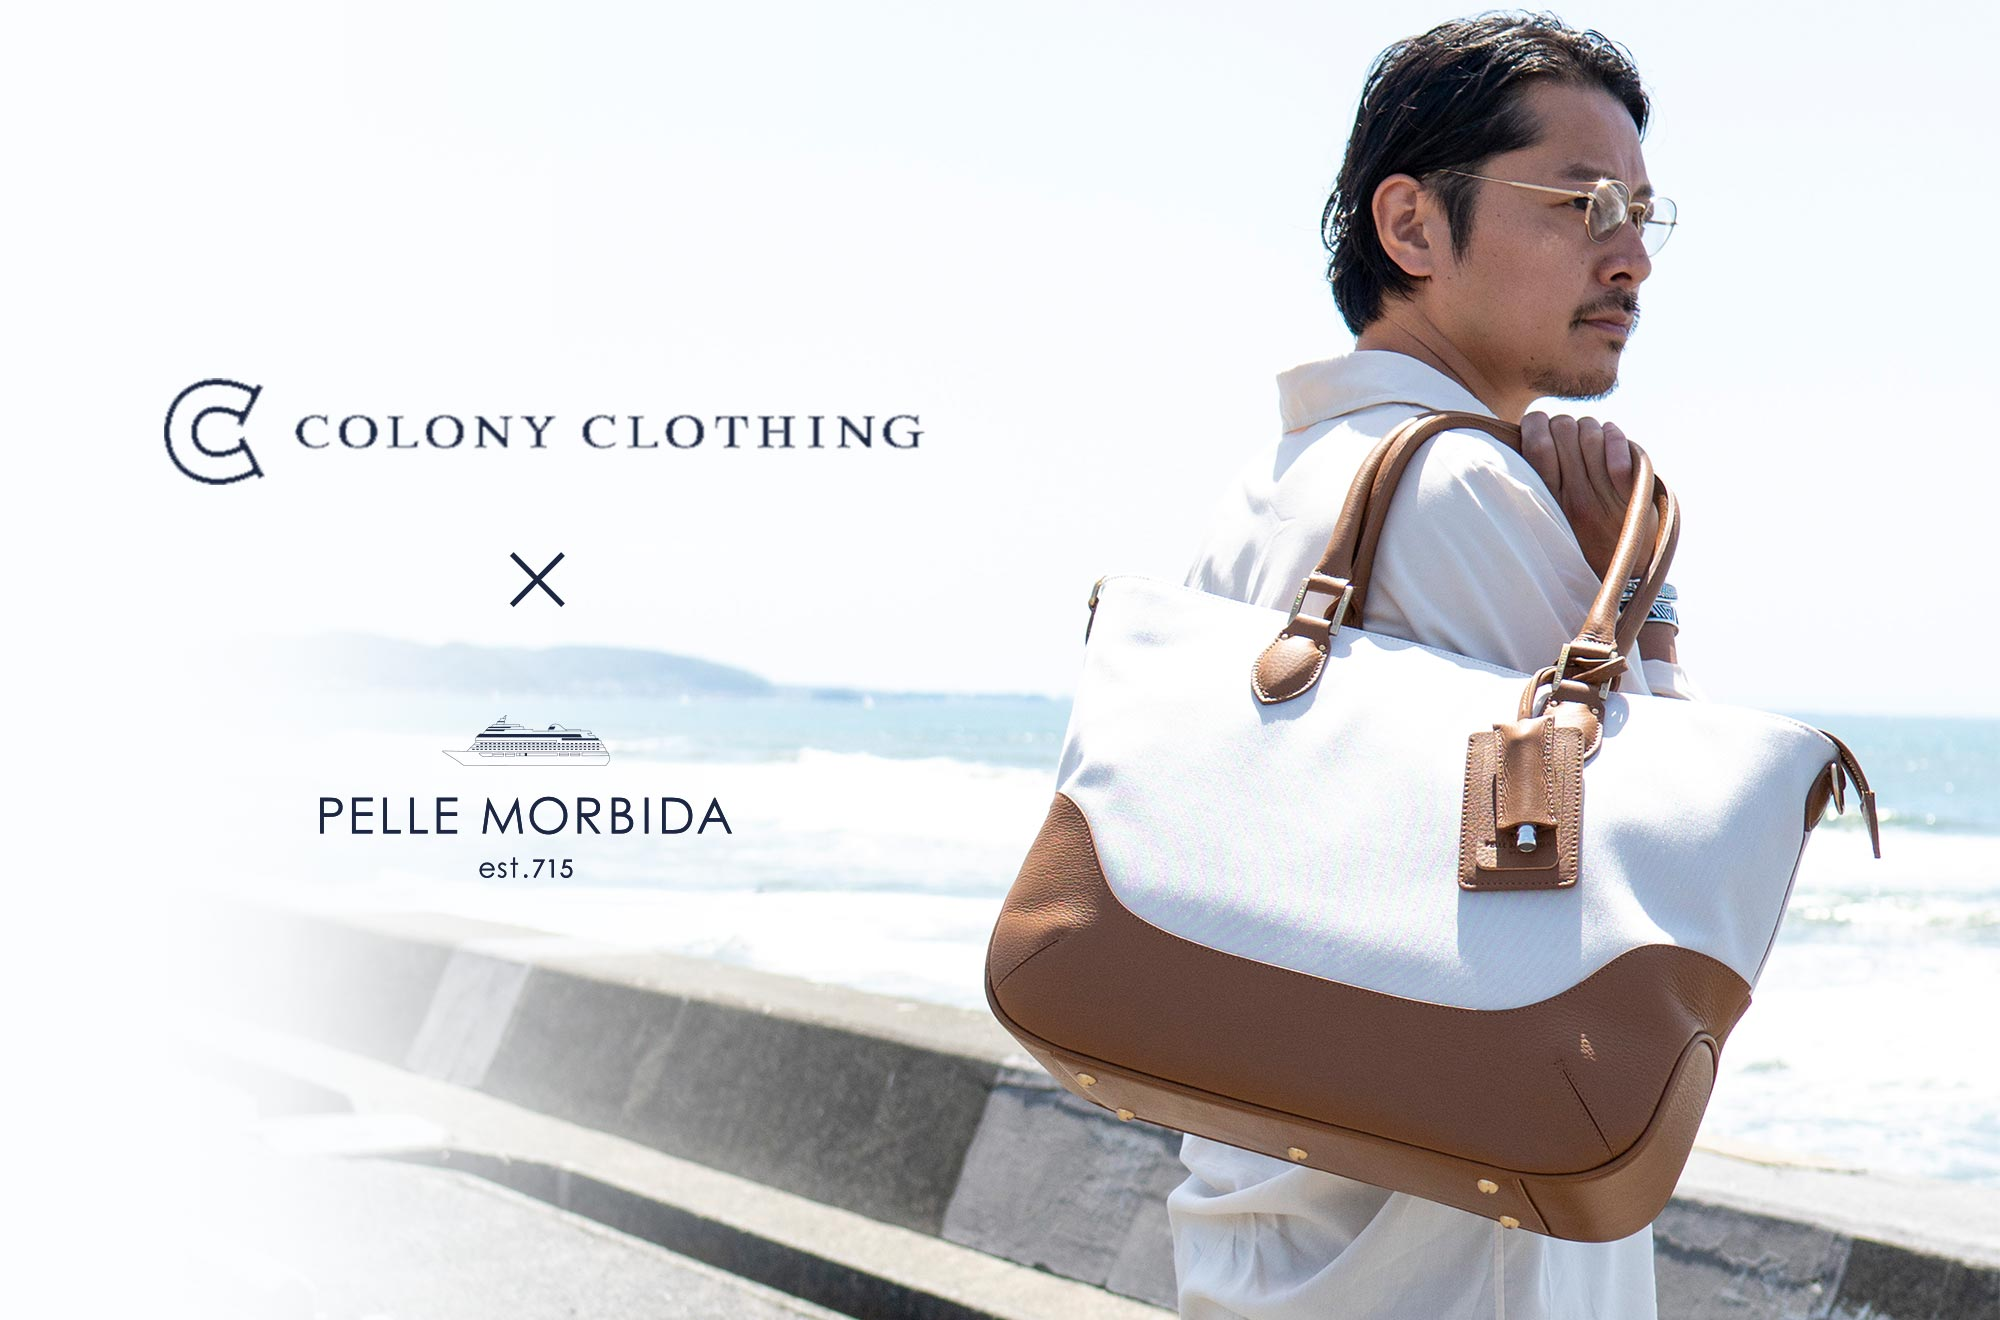 COLONY CLOTHING x PELLE MORBIDAのコラボコレクション第二弾発売!